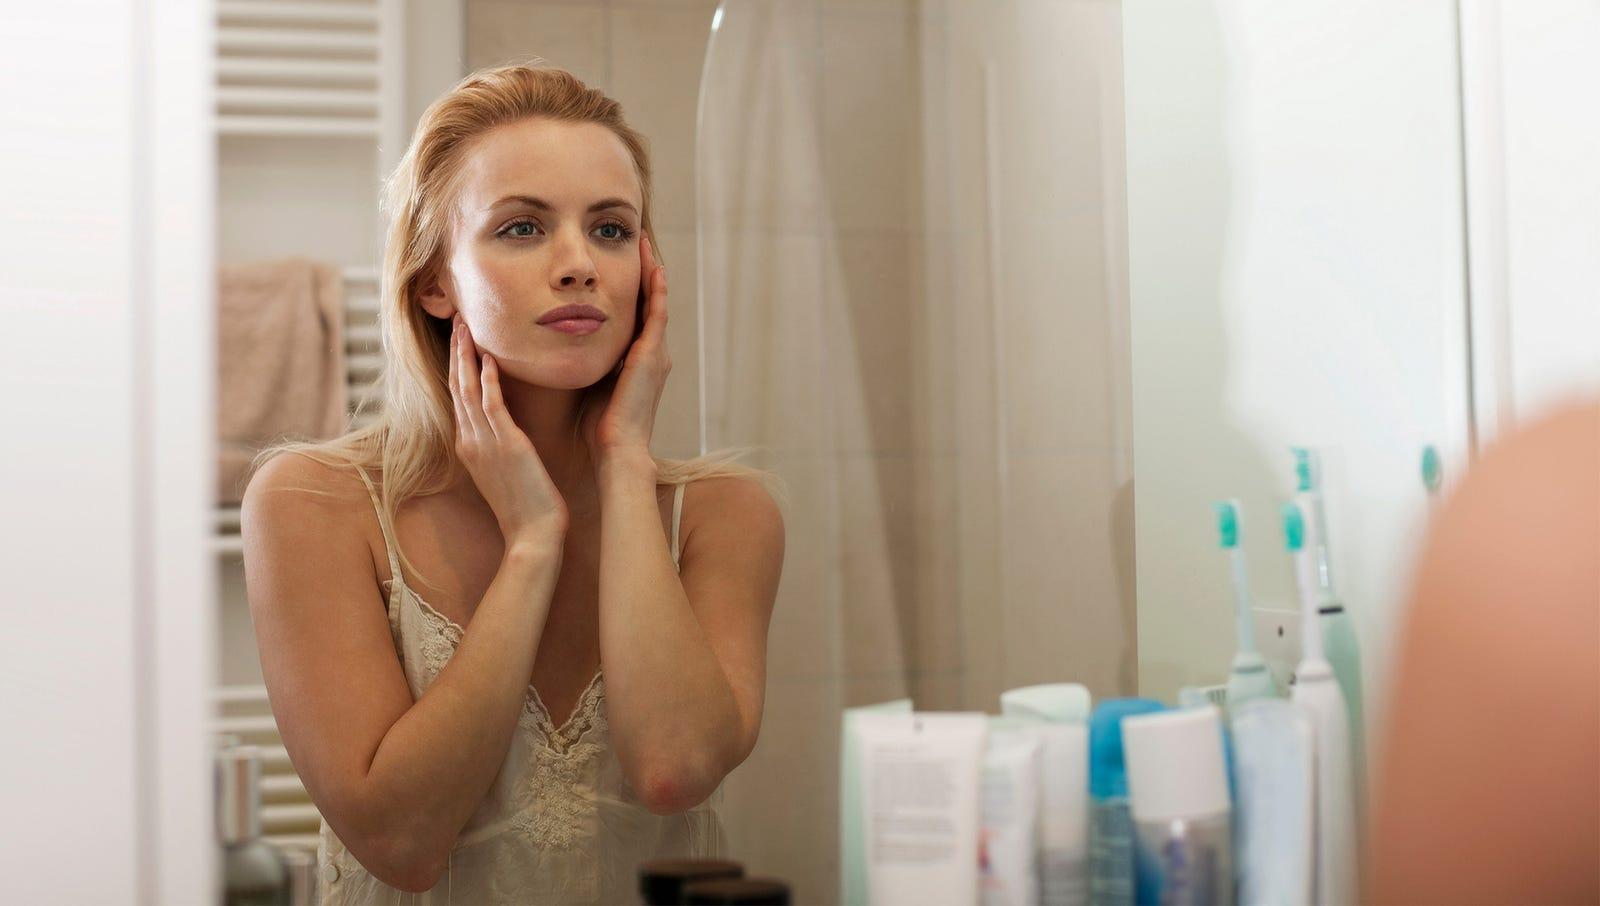 Woman Bids Farewell To Former Self Before Beginning New Skin Care Regimen